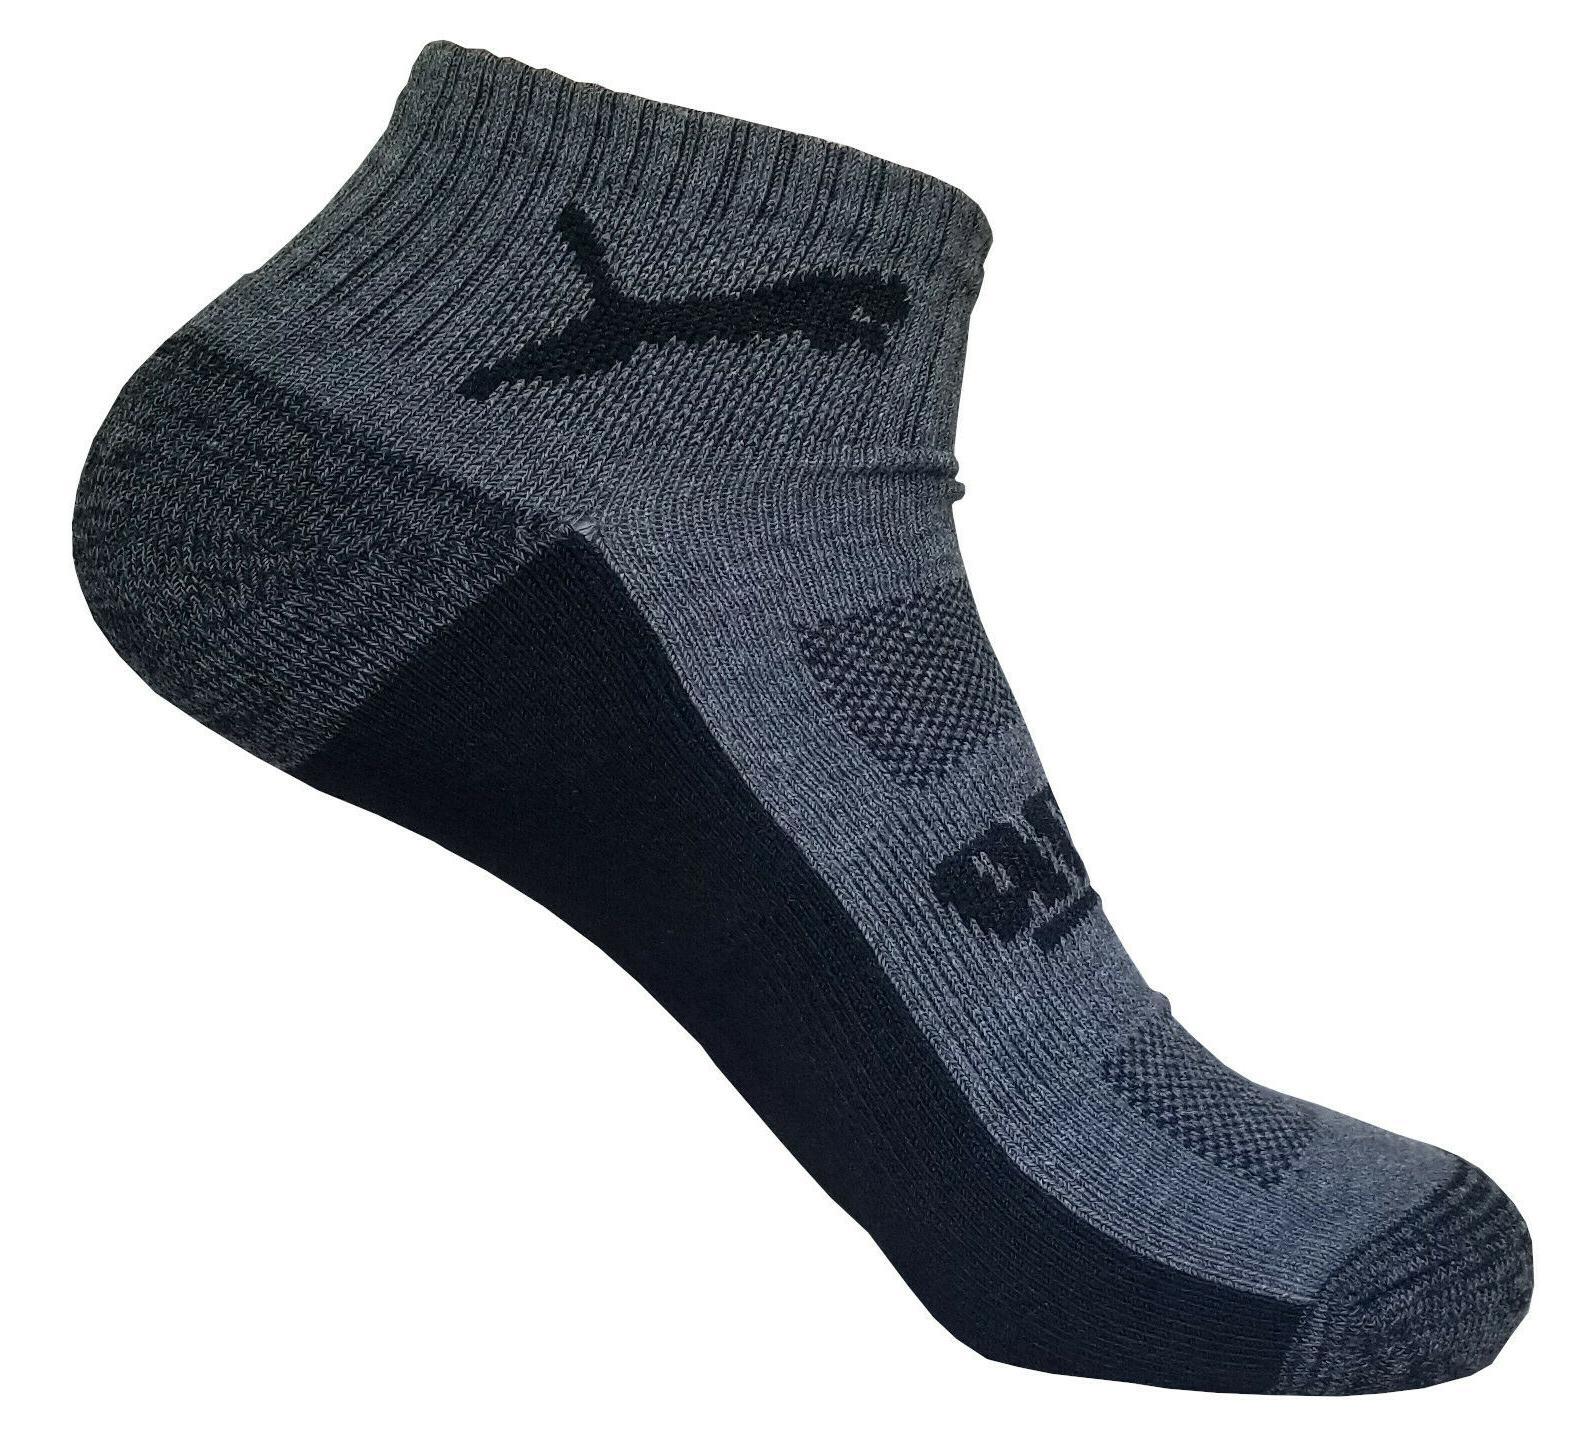 puma mens low quarter sock 6 pairs size 6-12